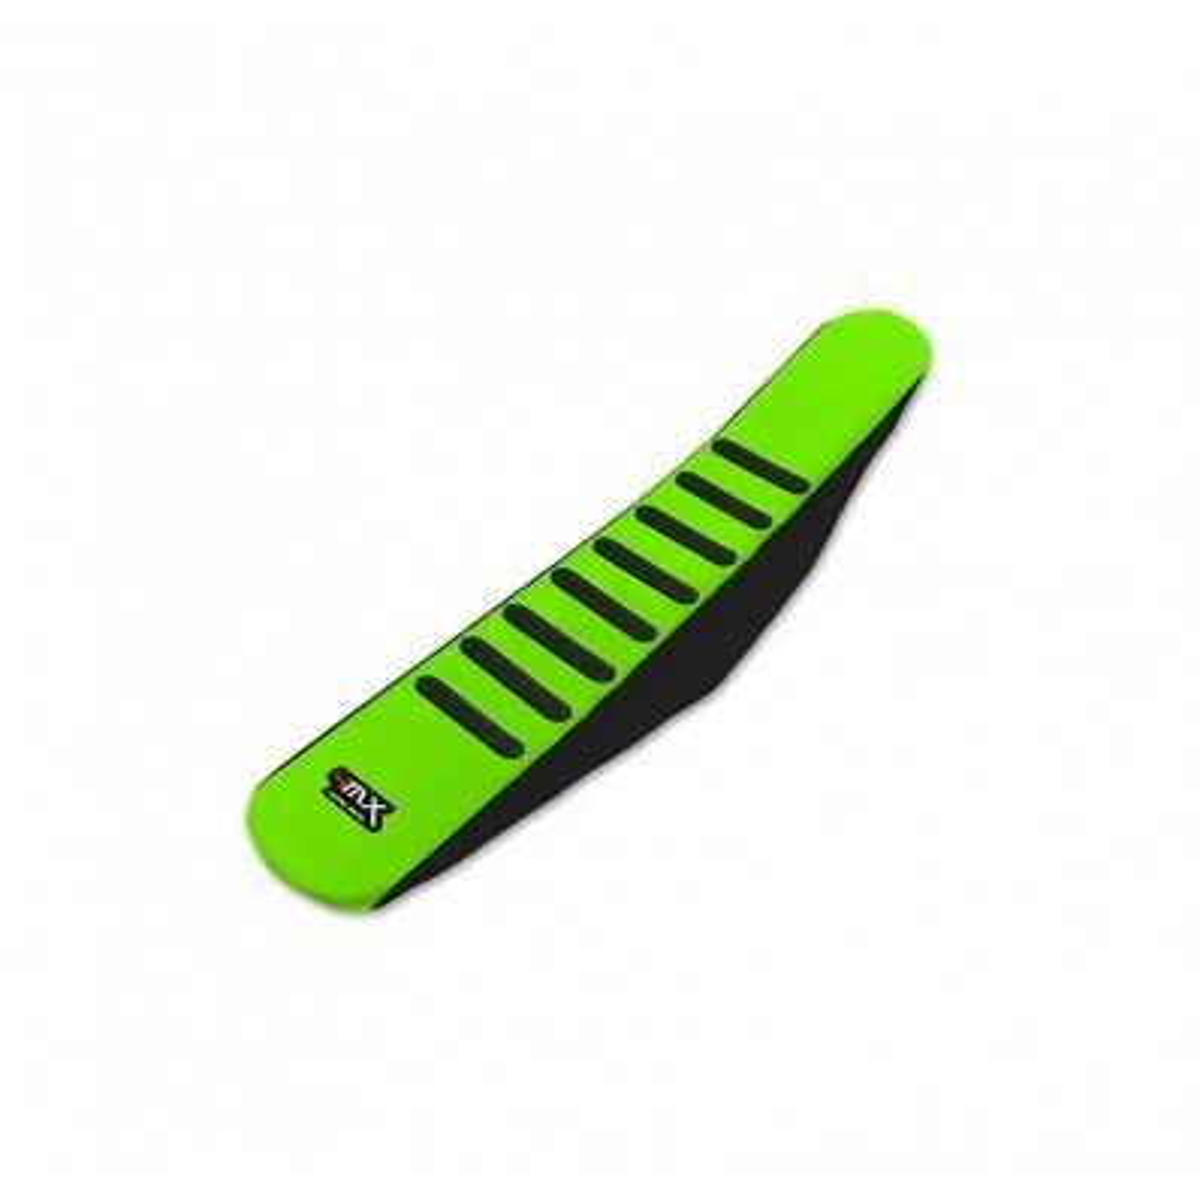 01CAP1029 - Funda Sillon 4Mx Kawasaki Kxf250 450 12 14´ Negro Verde